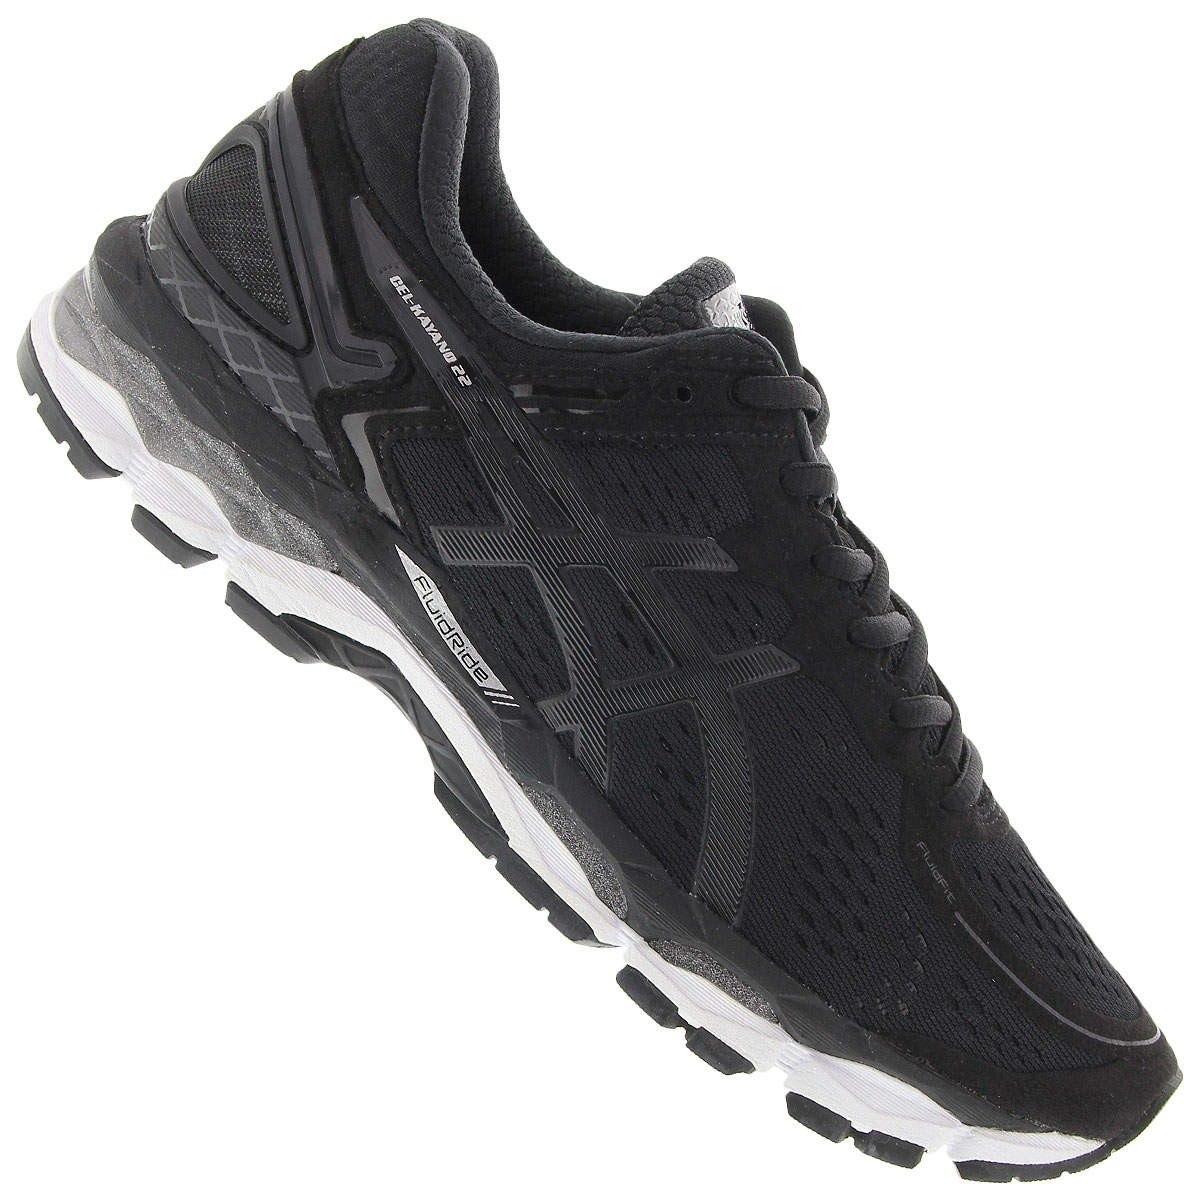 d448374e0 tênis masculino corrida asics t547n gel kayano 22 running. Carregando zoom.